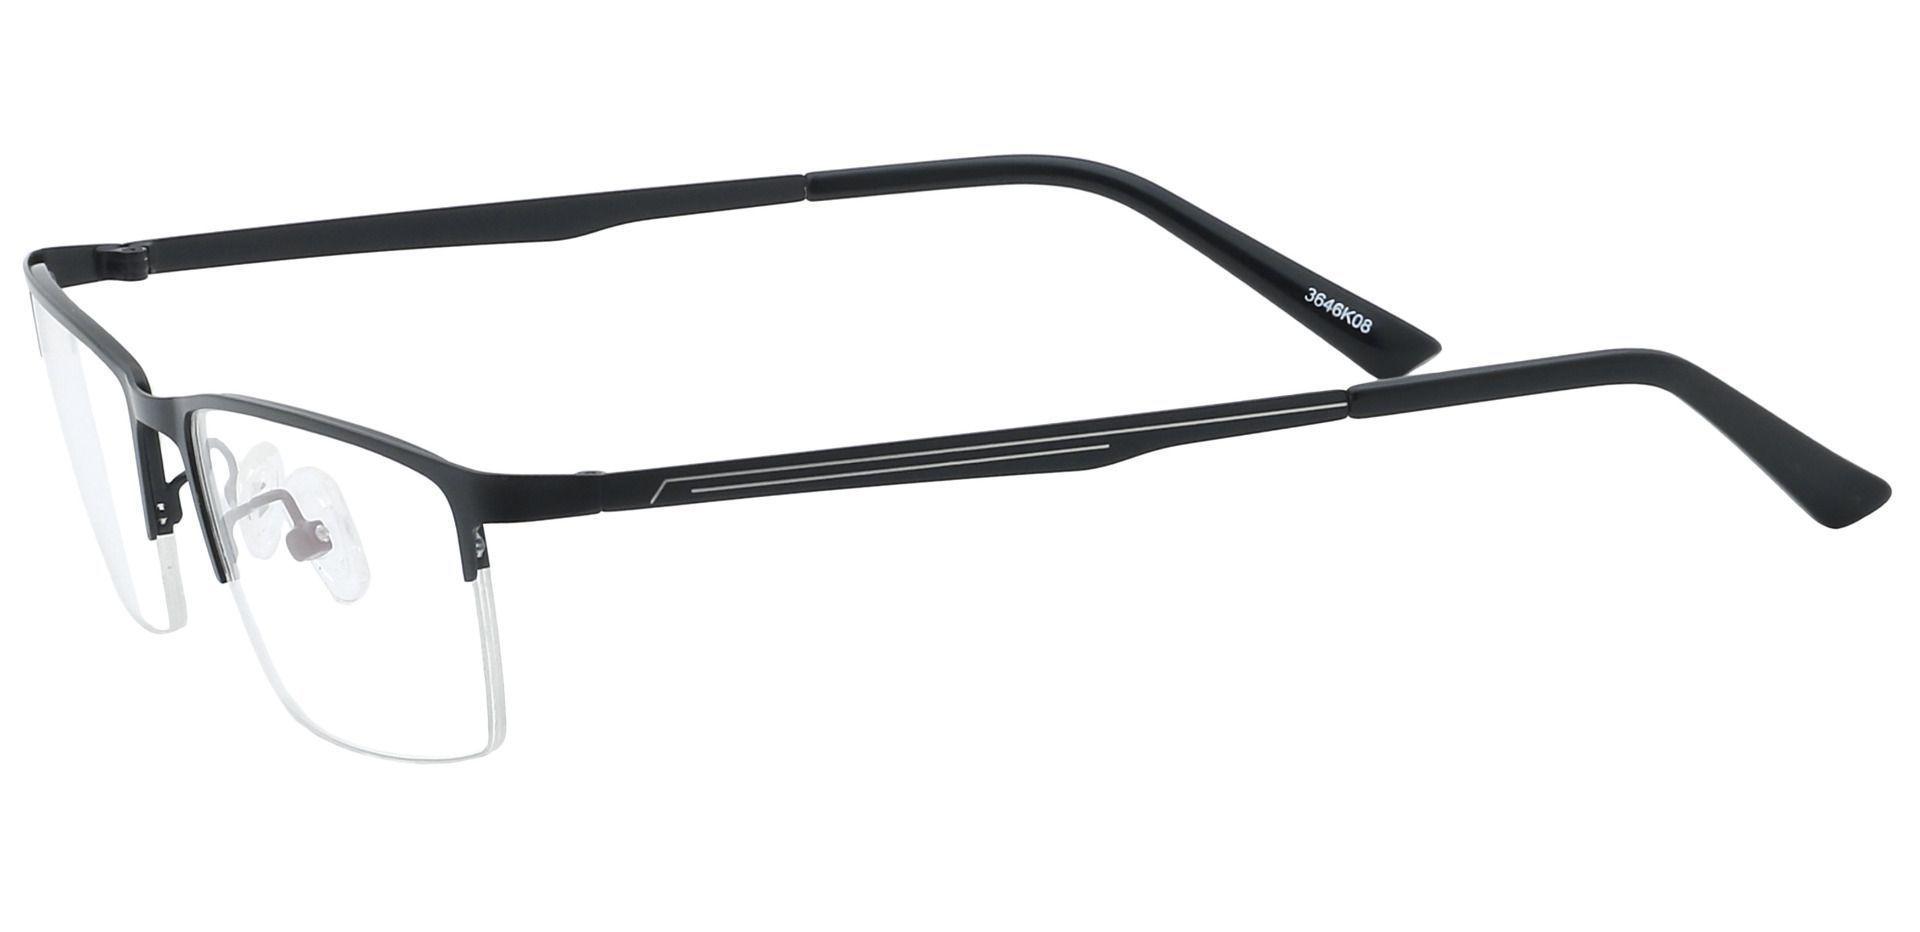 Lombard Rectangle Eyeglasses Frame - Black